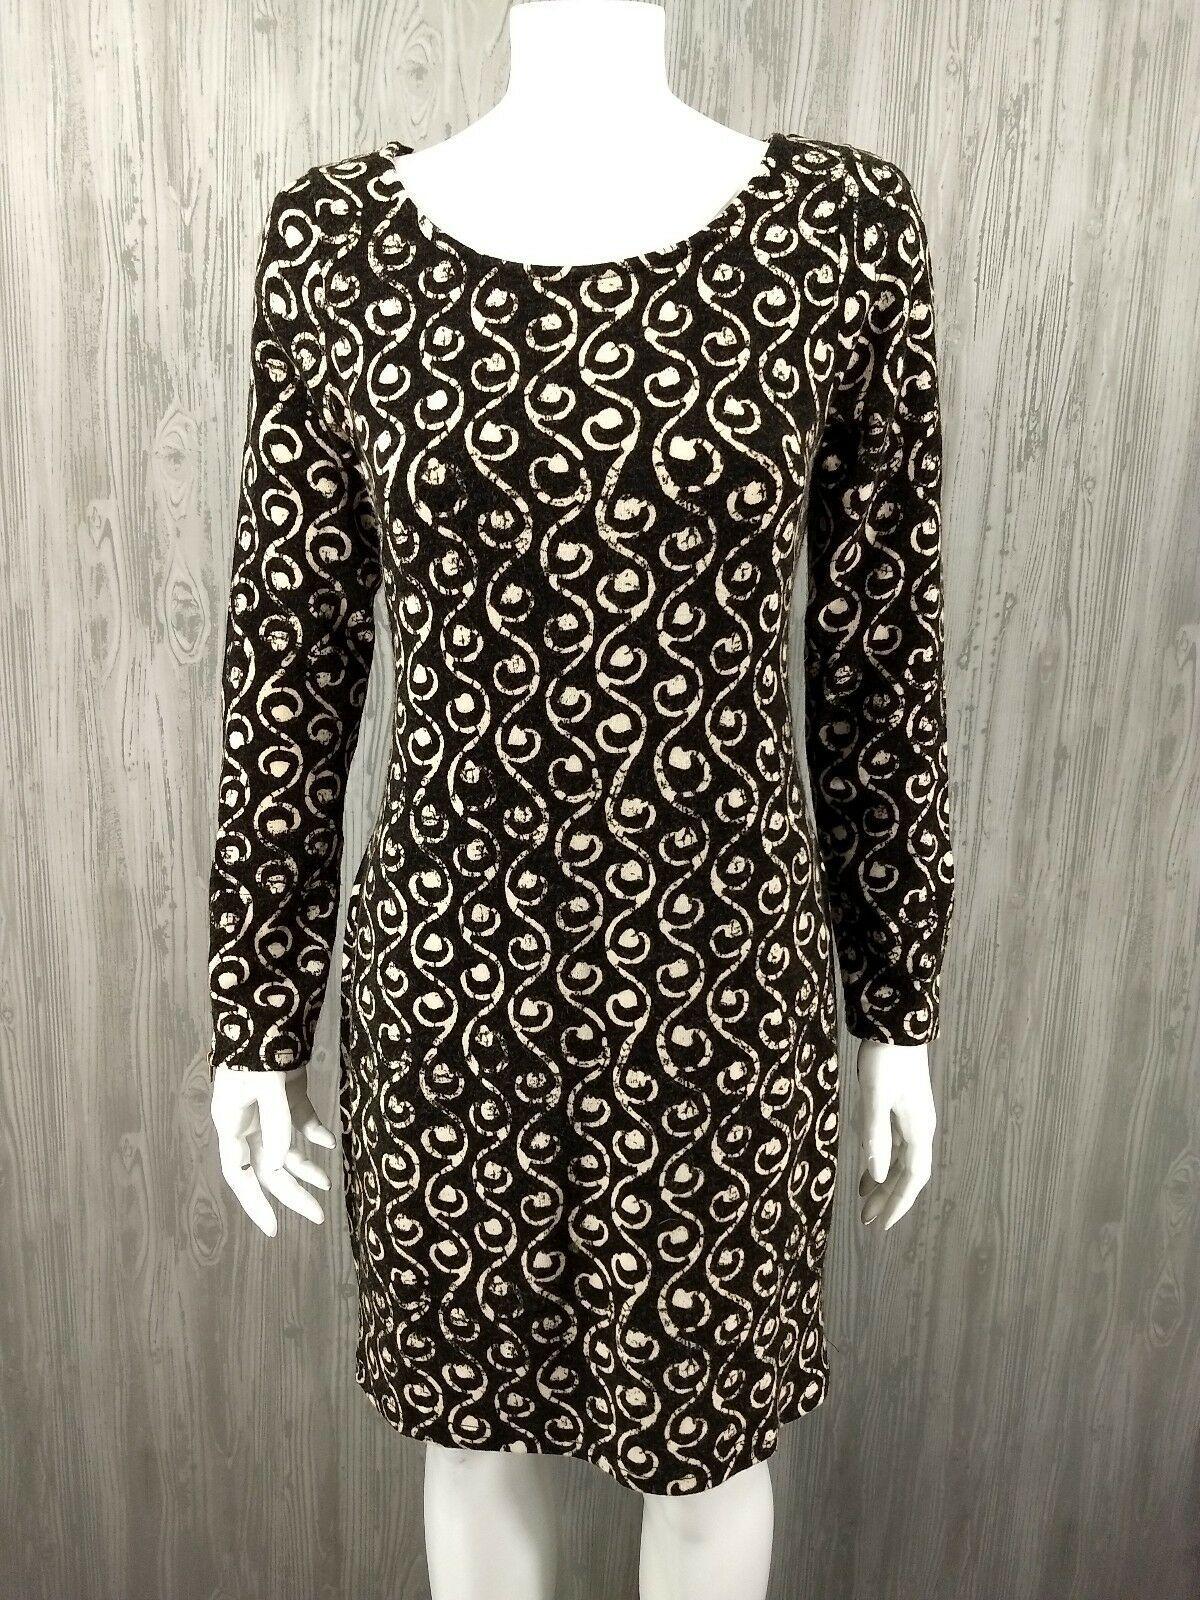 ca3408170b4 Aryeh Anthropologie Sweater Dress Women Medium Brown Print Retro Zipper - Sweater  Dresses - Shop for